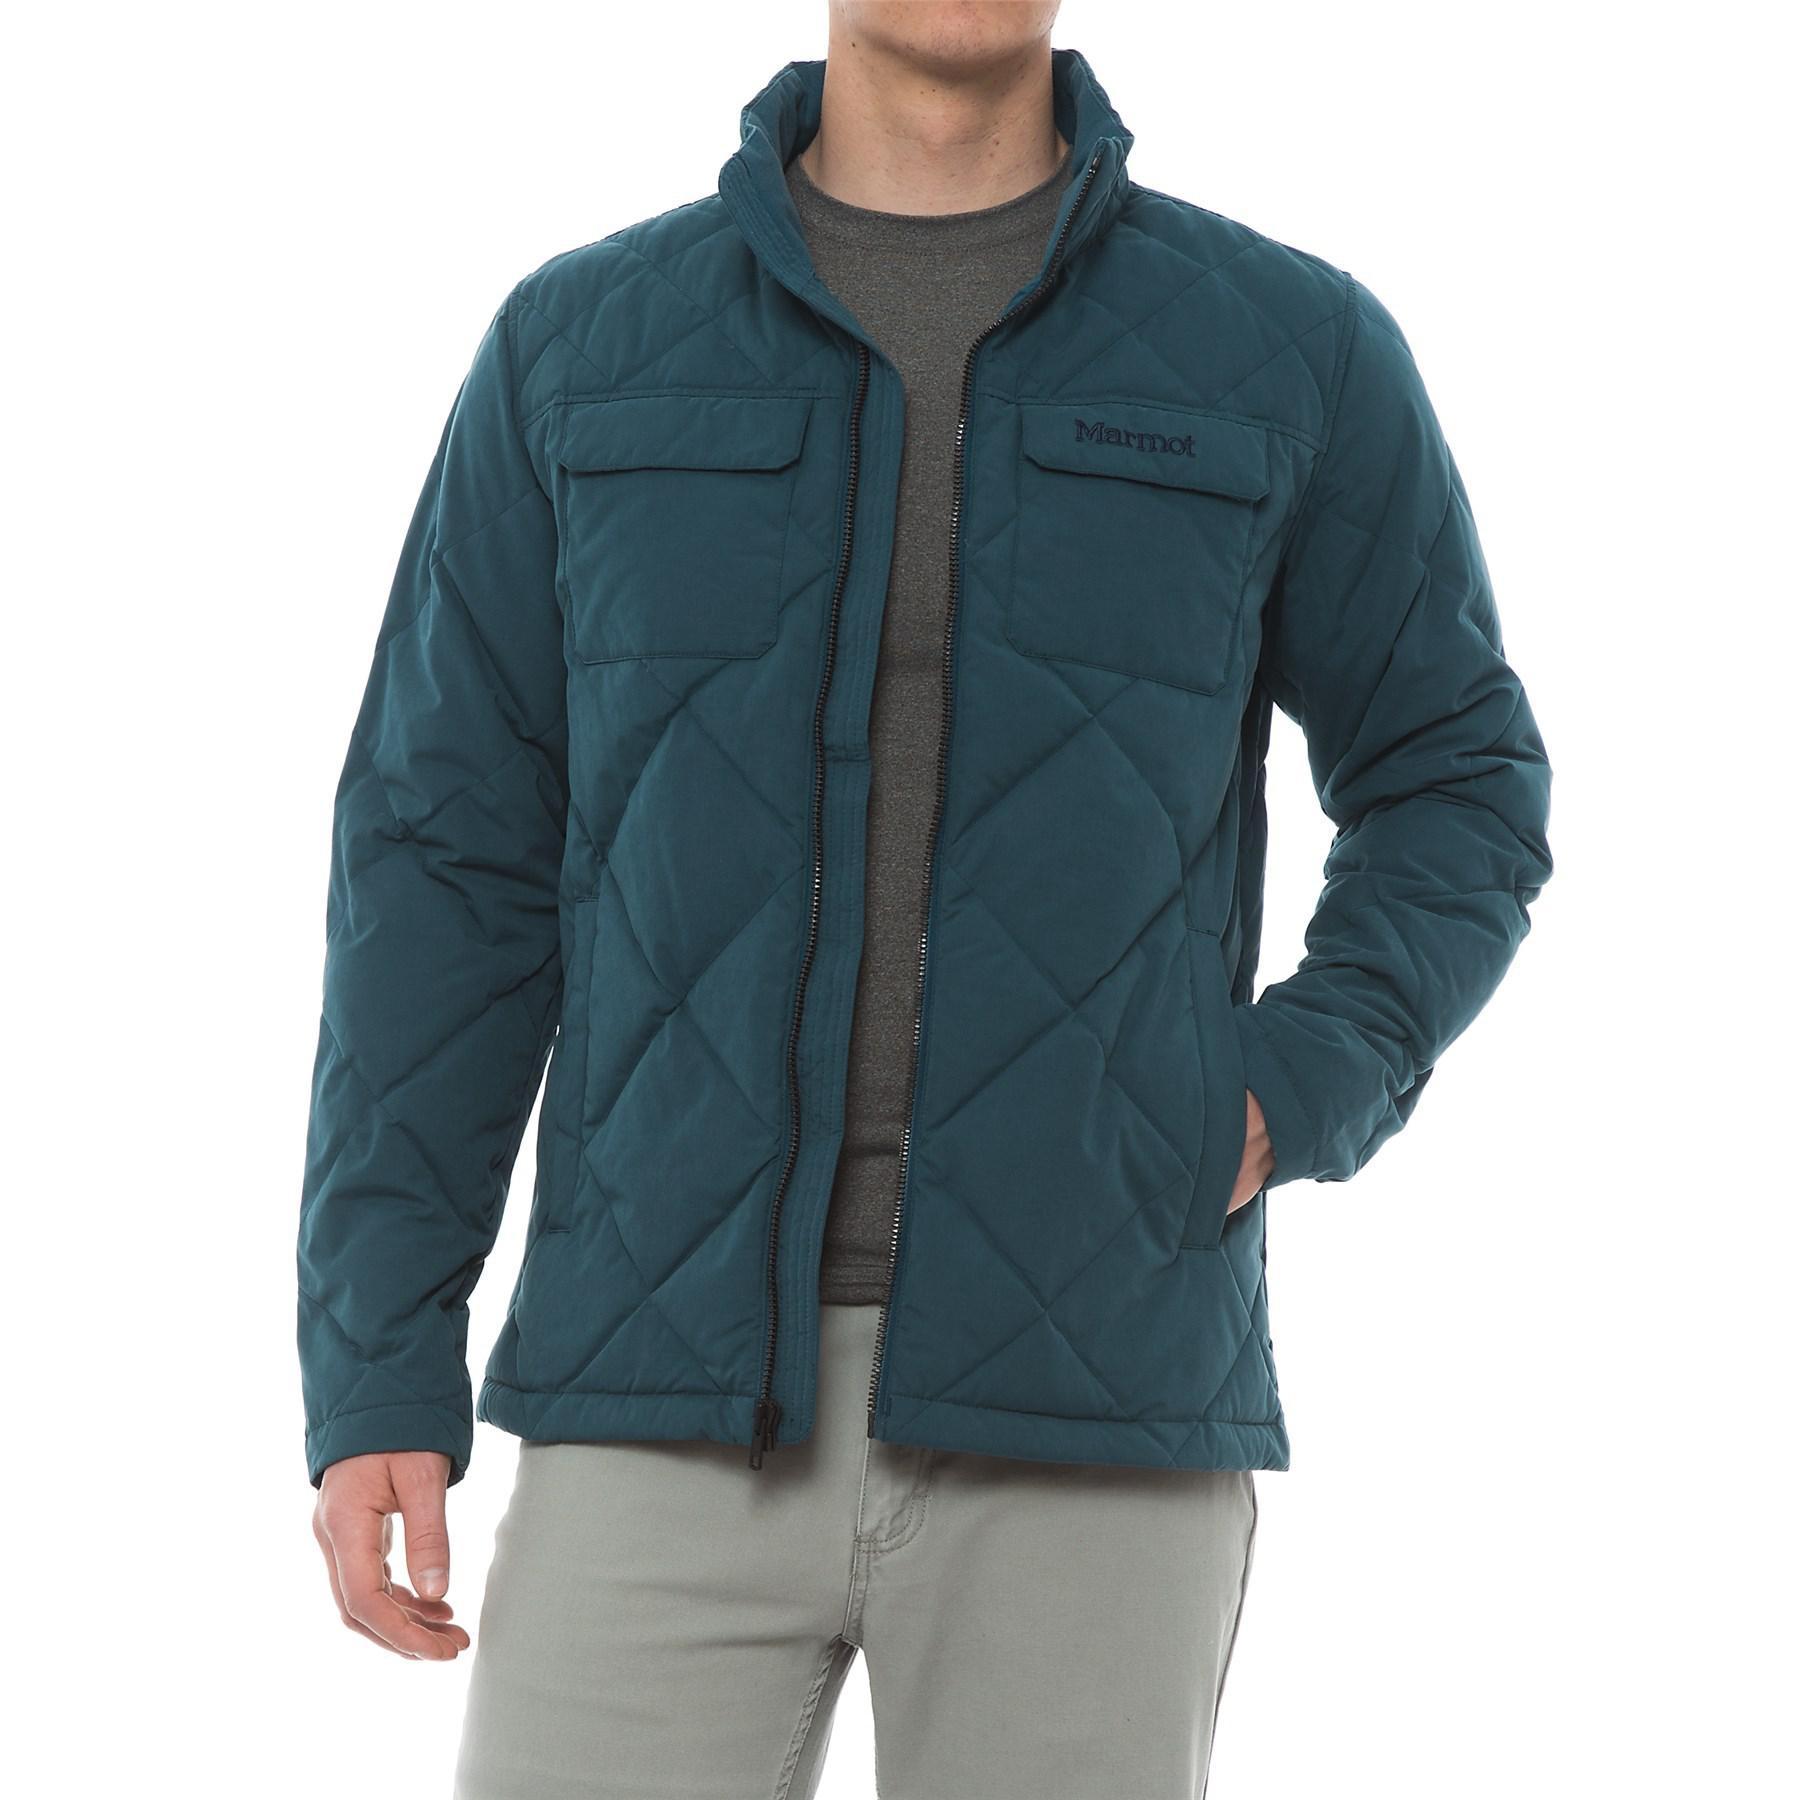 Lyst - Marmot Burdell Down Jacket in Blue for Men bbc40b11fe